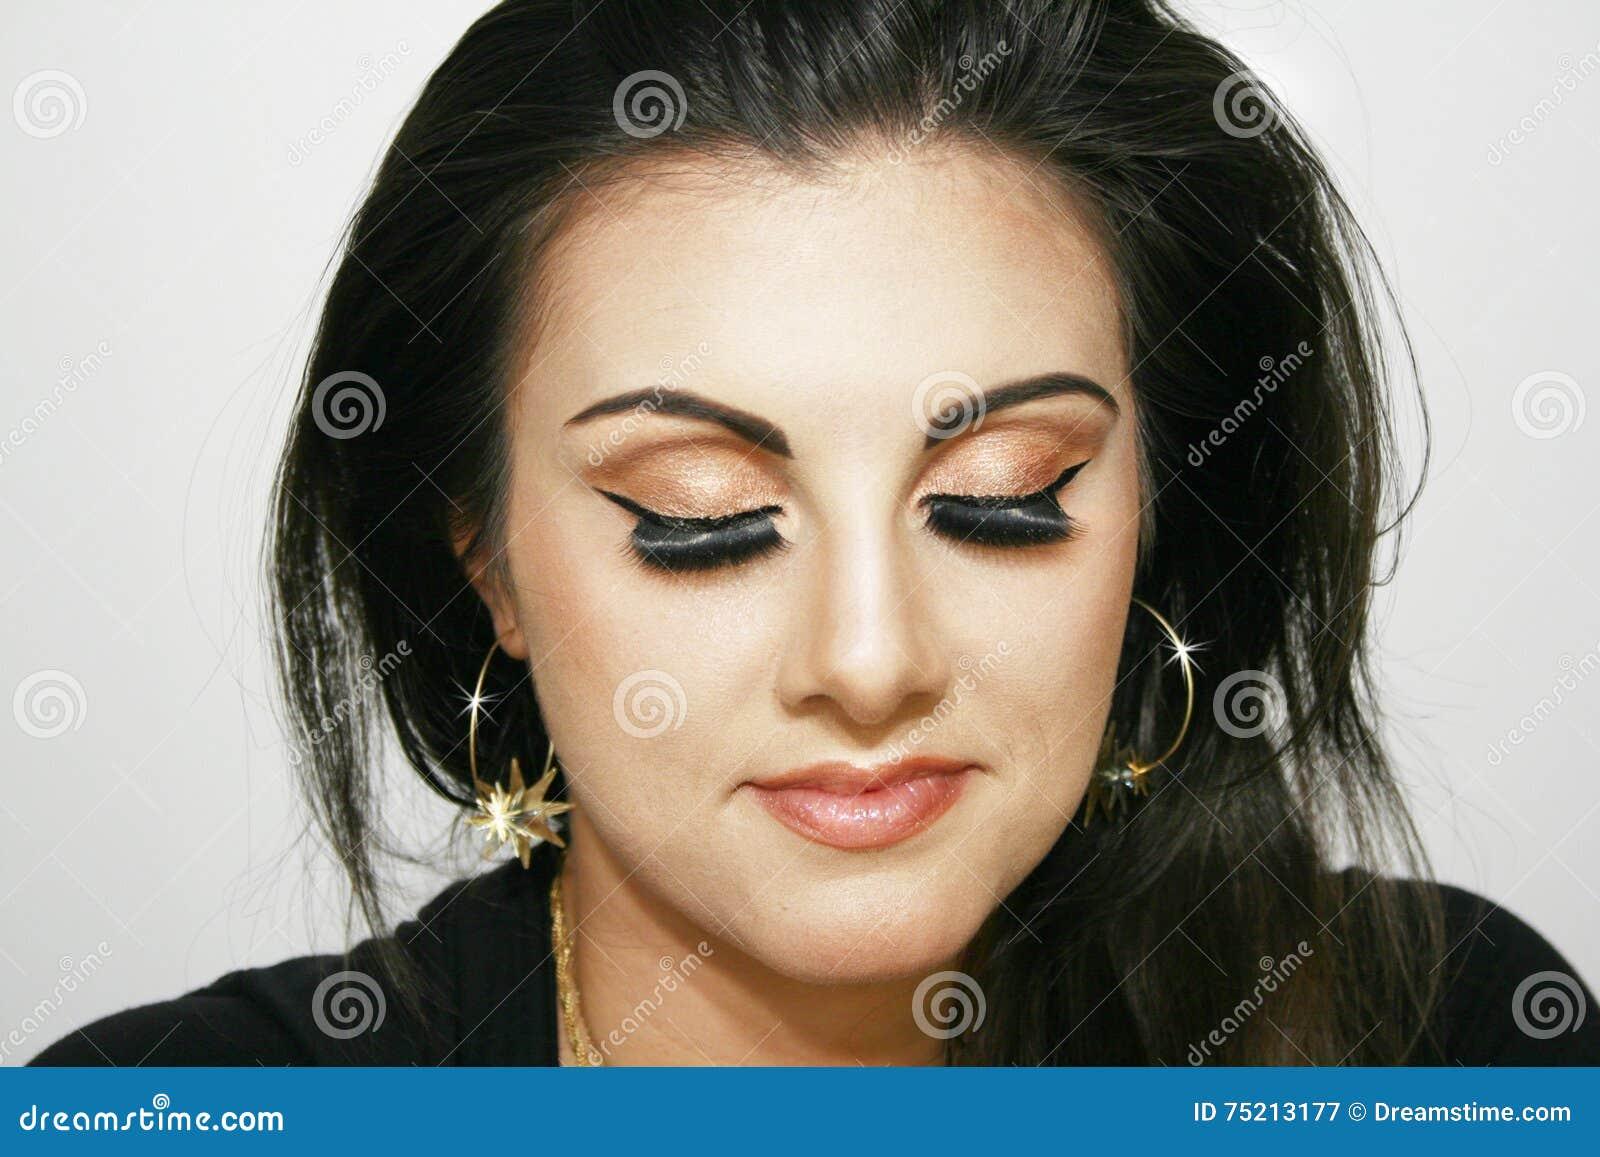 Girl with brown eye makeup,Beauty girl,